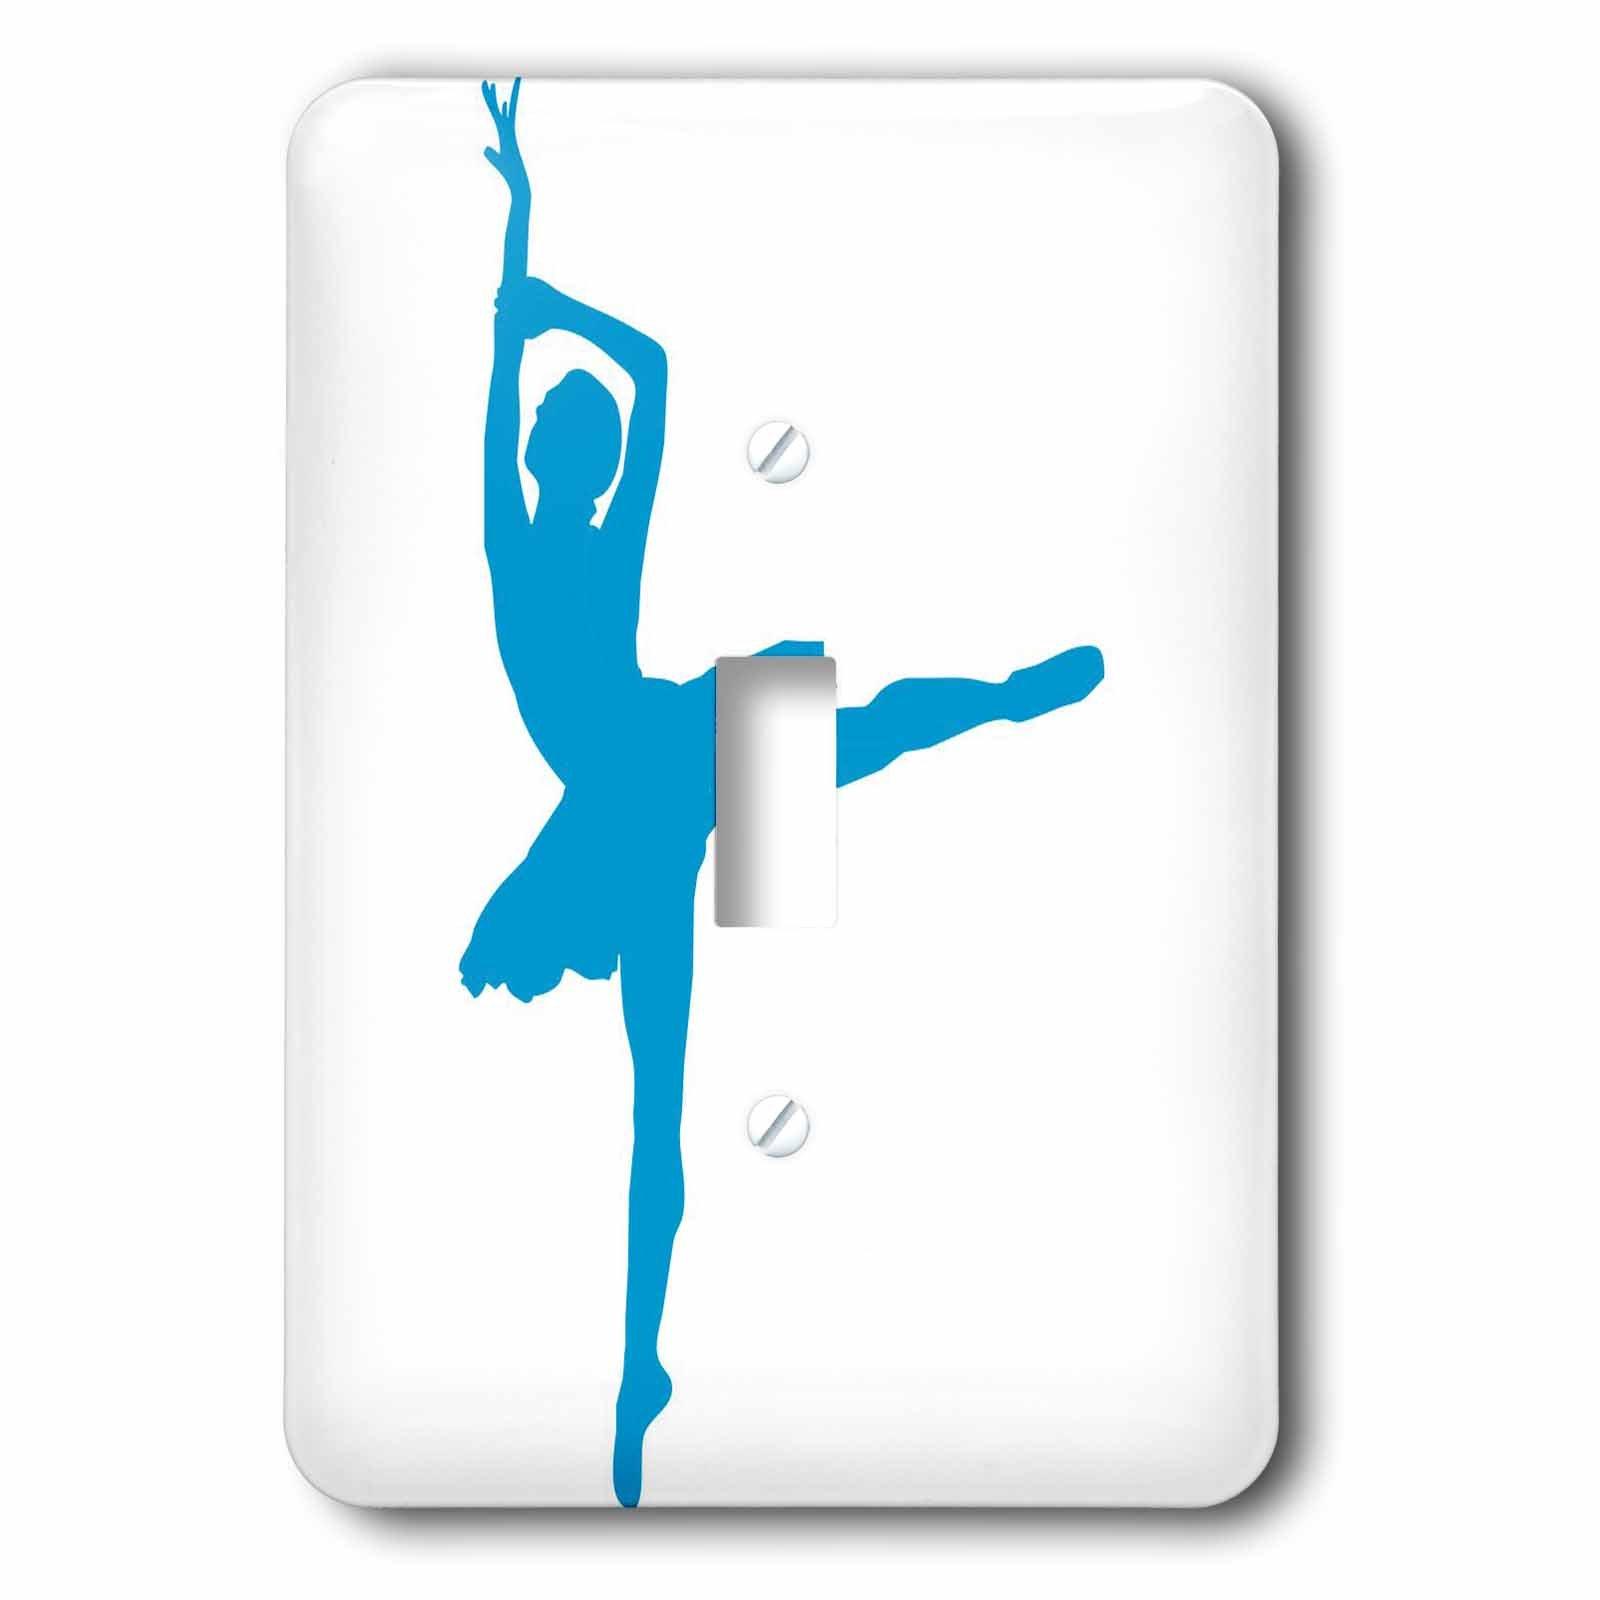 3dRose lsp_157840_1 Blue Ballet Dancer Light Switch Cover